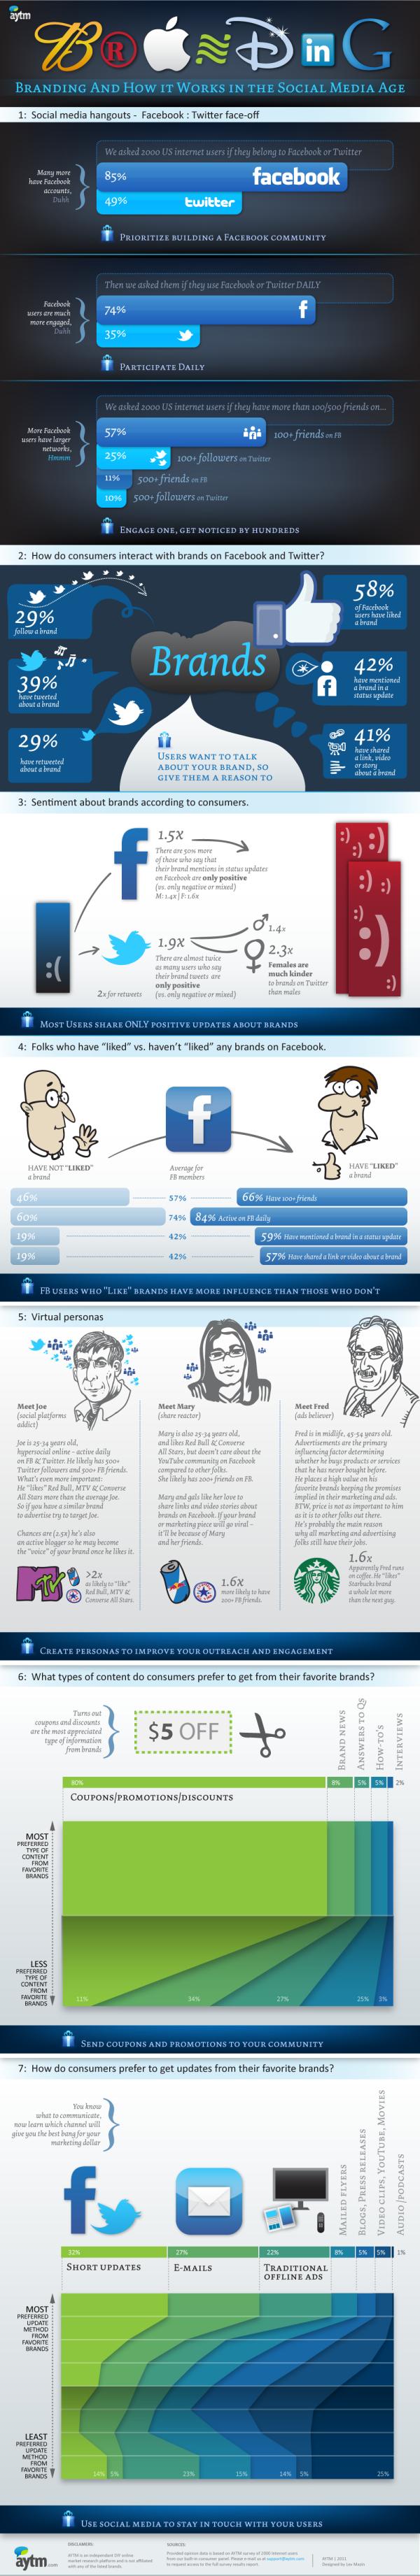 Branding in the Social Media Age resized 600